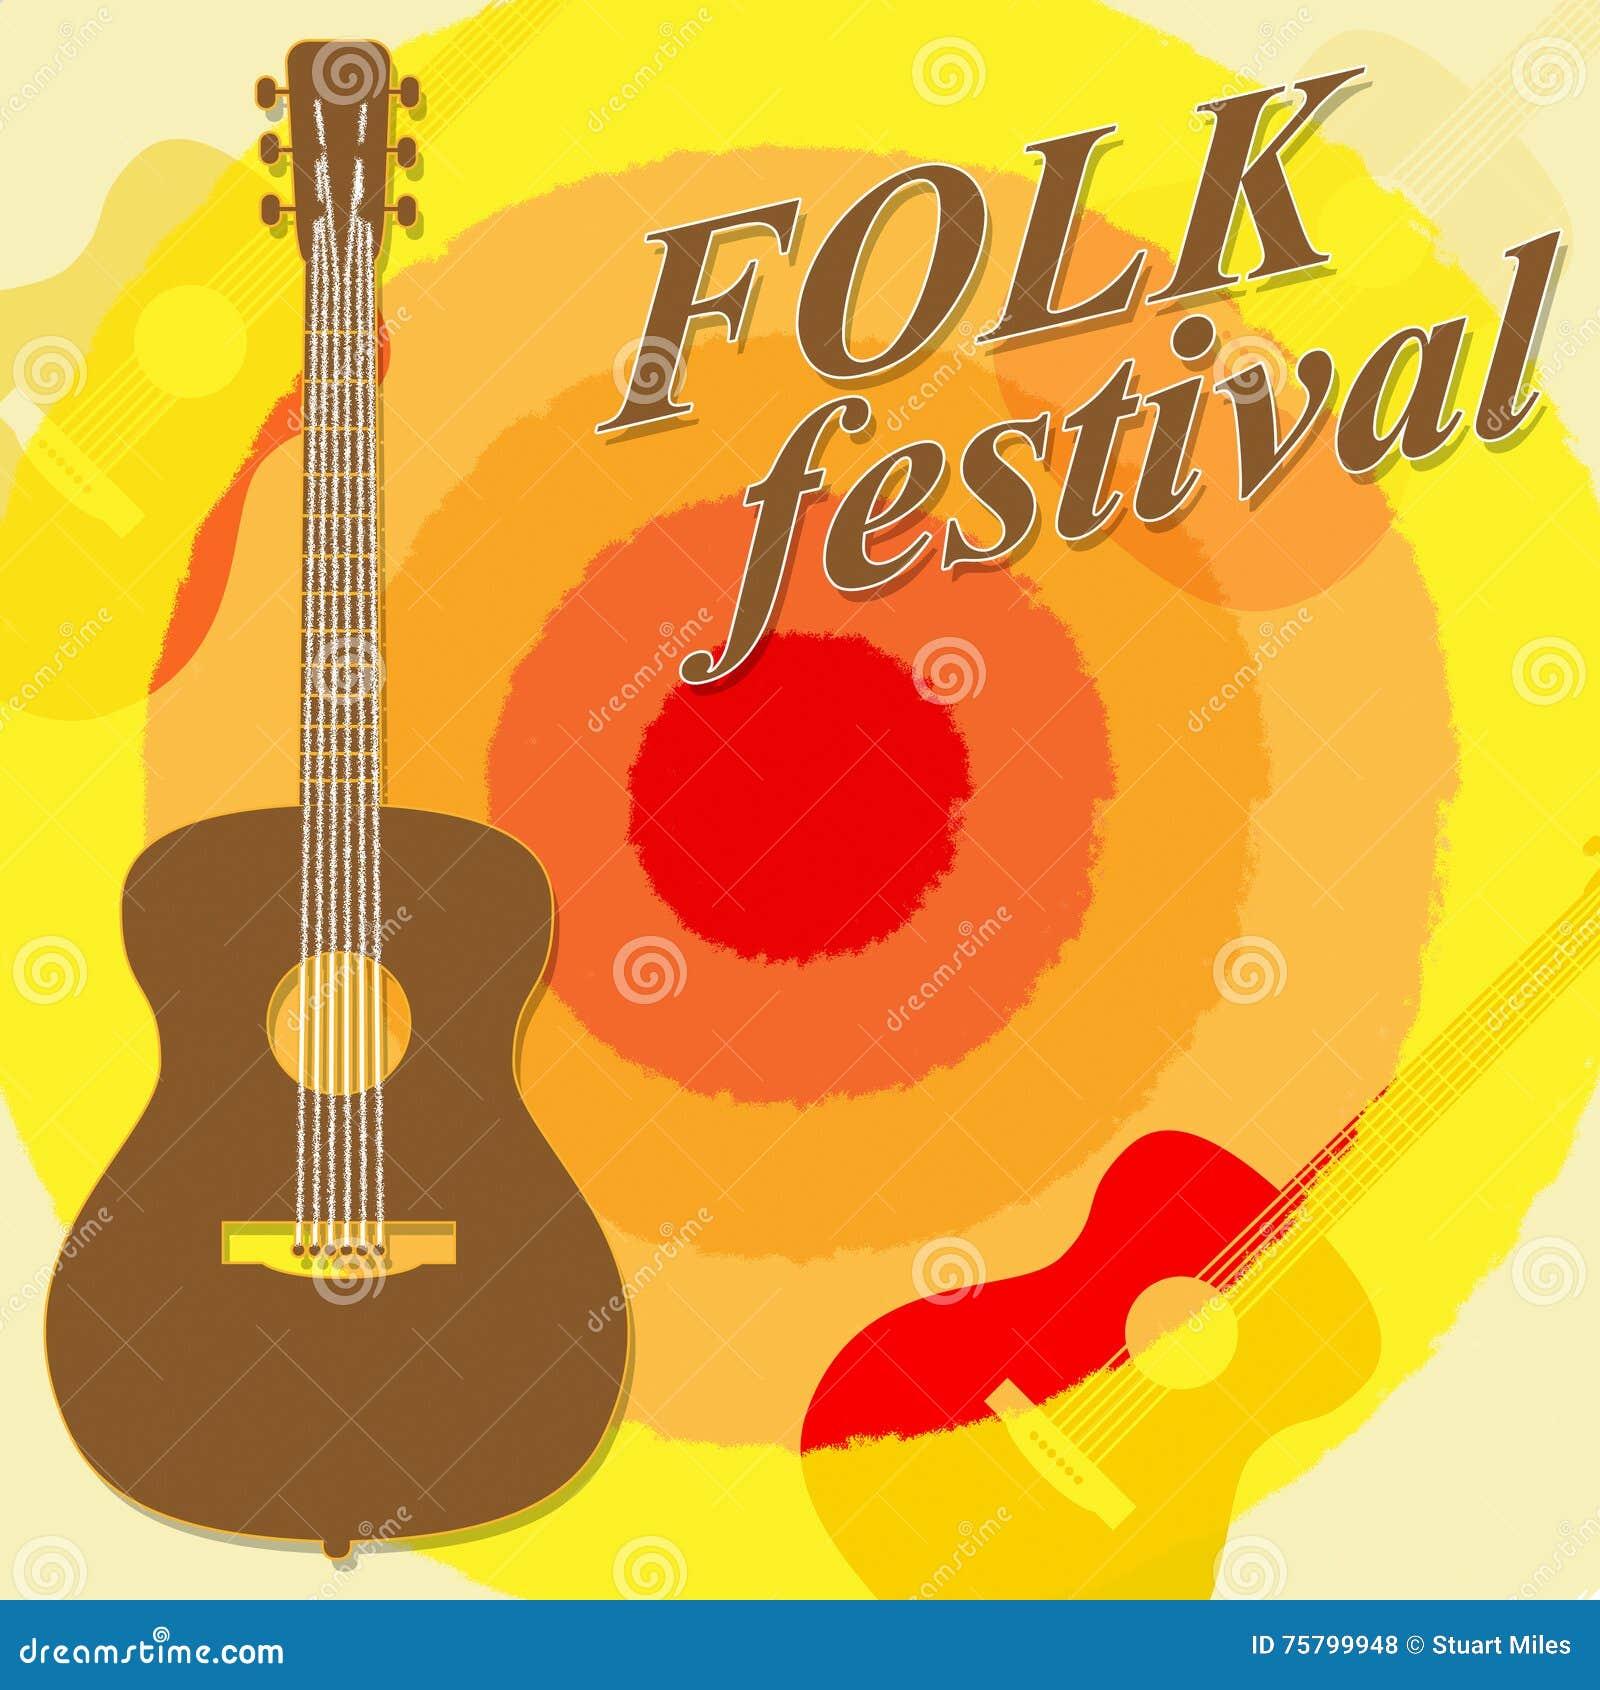 Folk Festival Shows Country Music And Ballard Stock